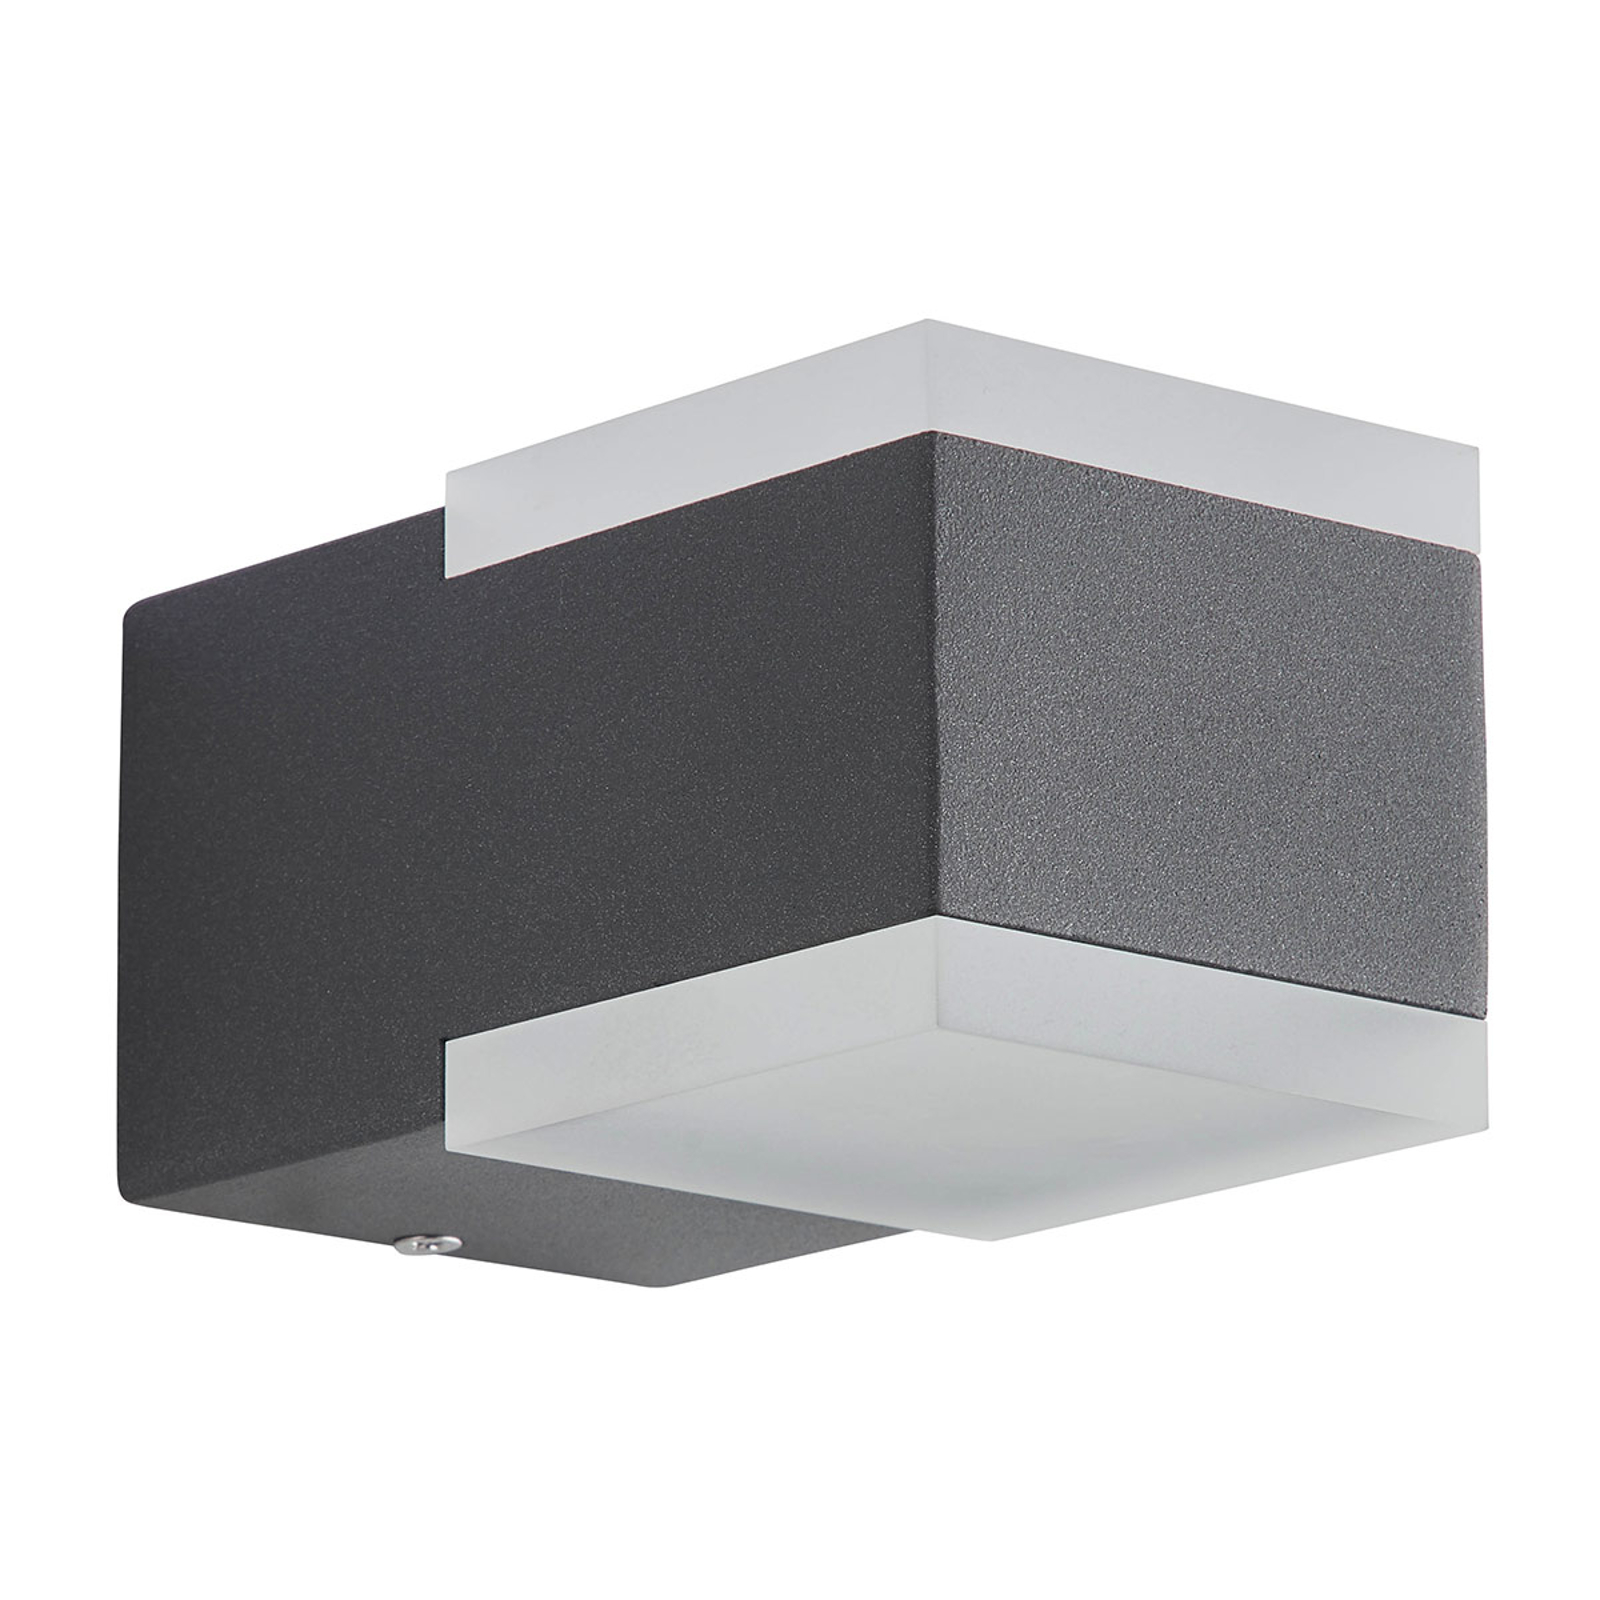 AEG Amity LED-Außenwandleuchte, zweiflammig